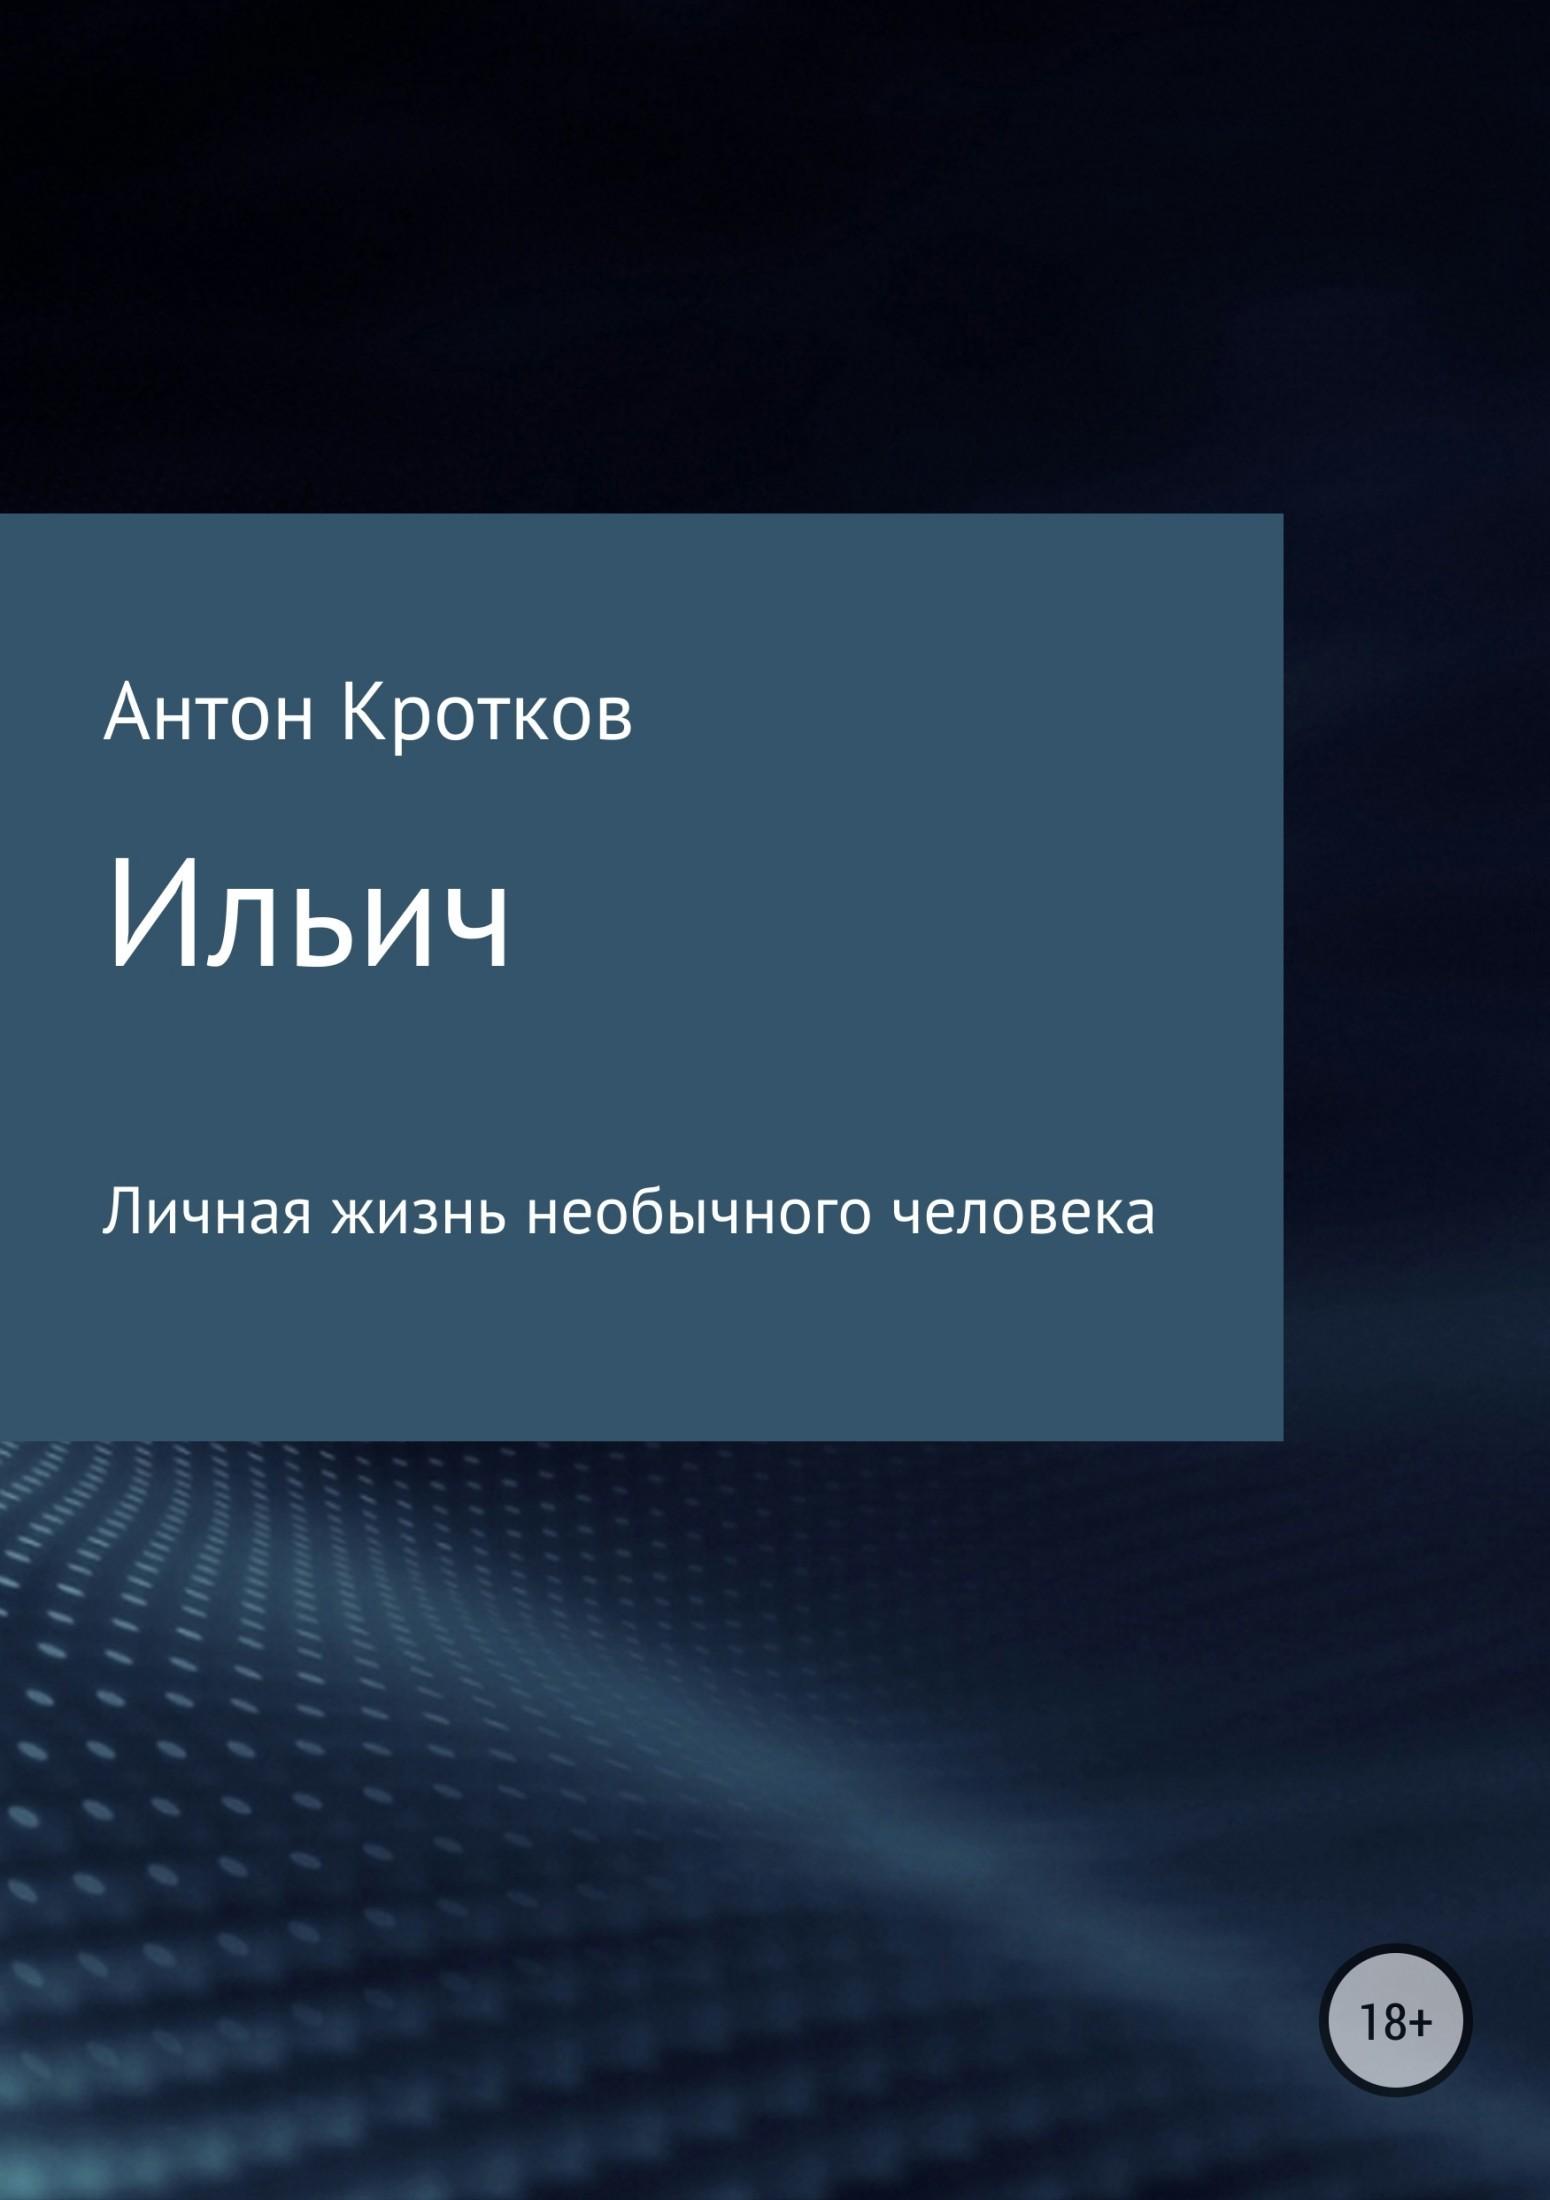 Антон Павлович Кротков Ильич антон павлович кротков последний вираж штрафбата